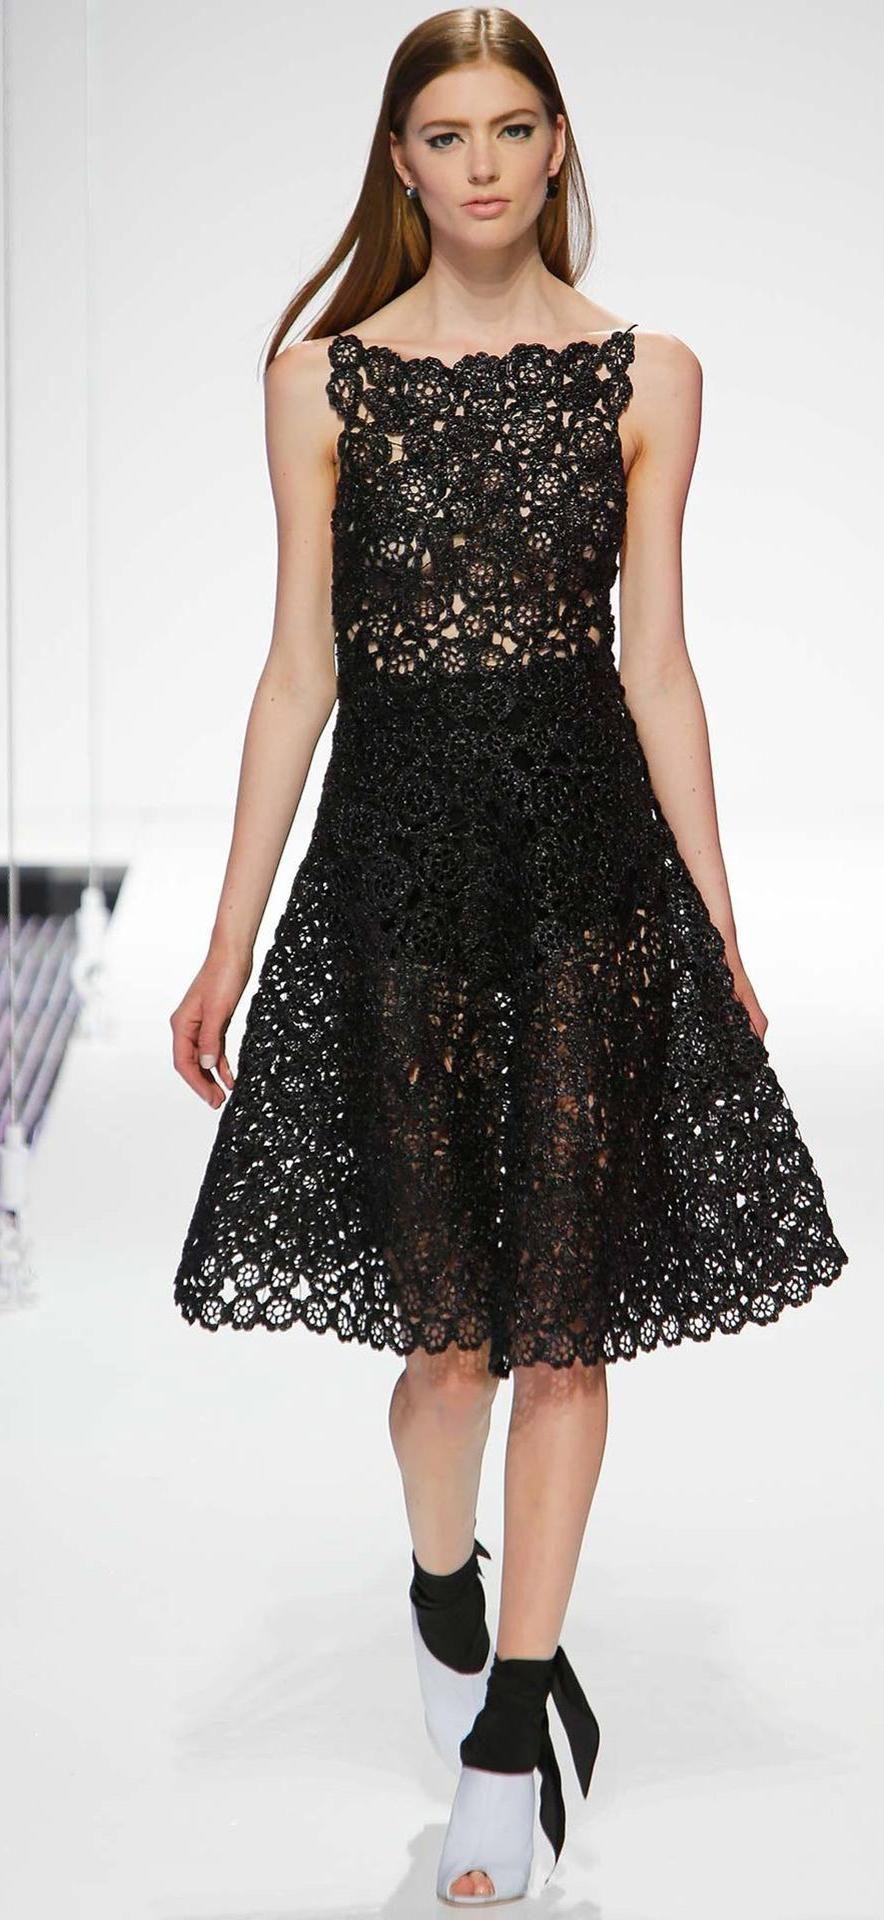 Christian #Dior Resort 2015